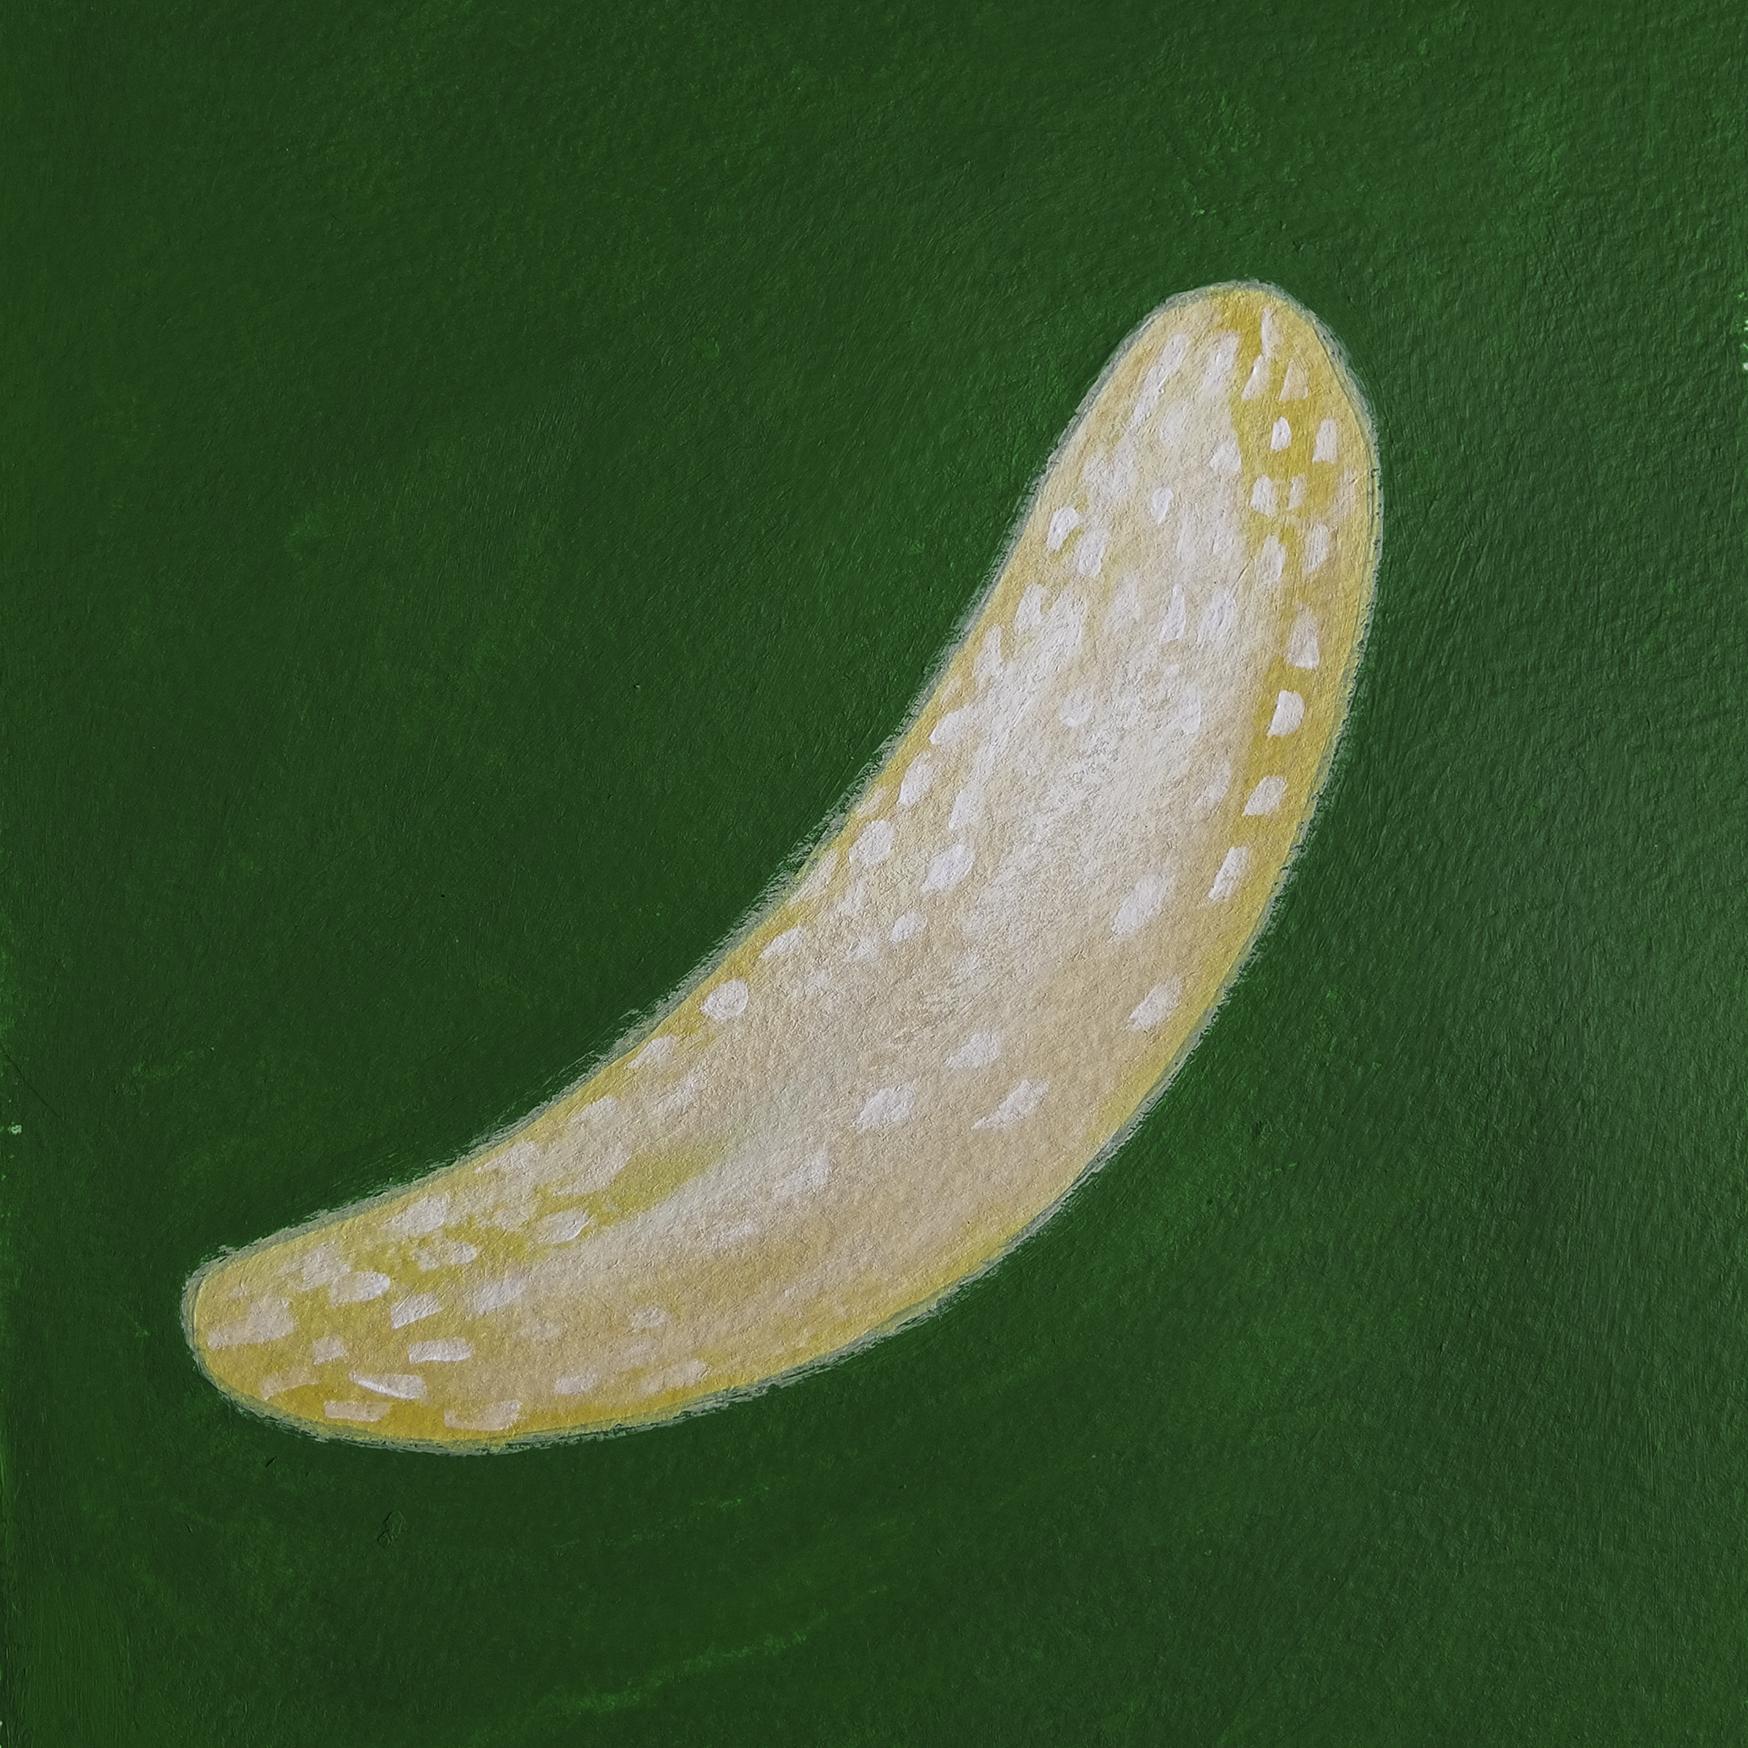 banana222.jpg